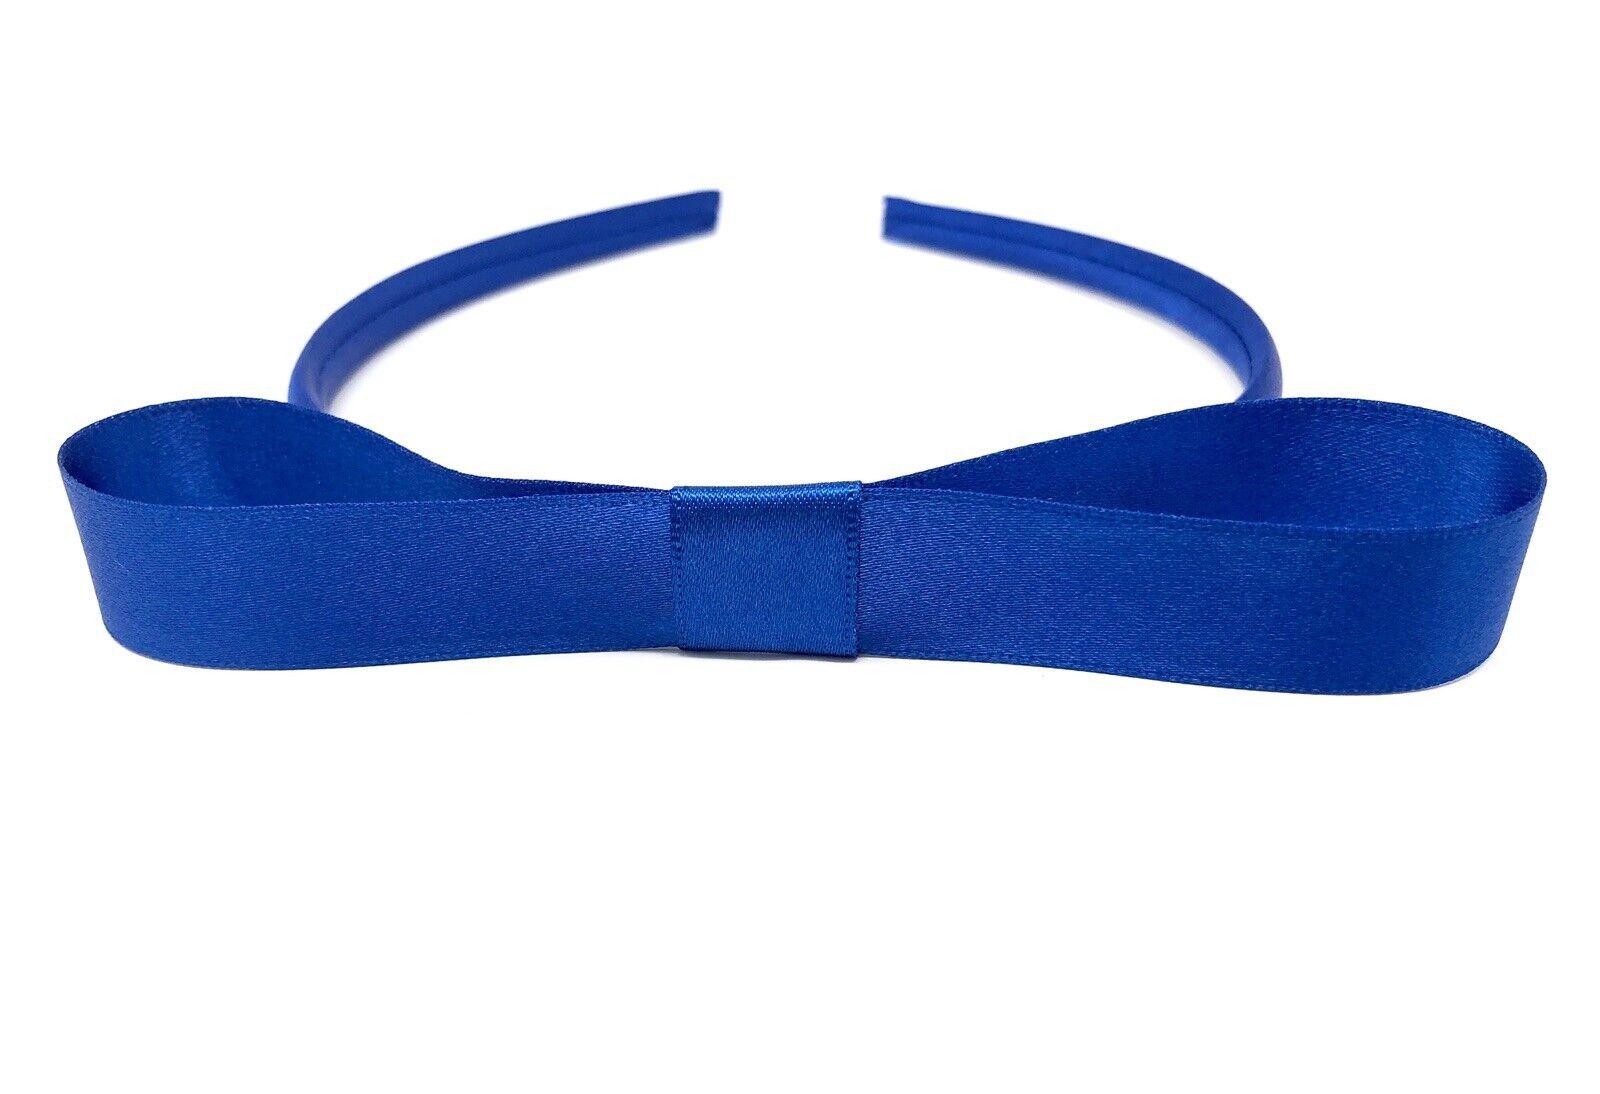 Royal Blue Matilda Style Snow White Satin Girls Alice Band Headband Hairband Bow